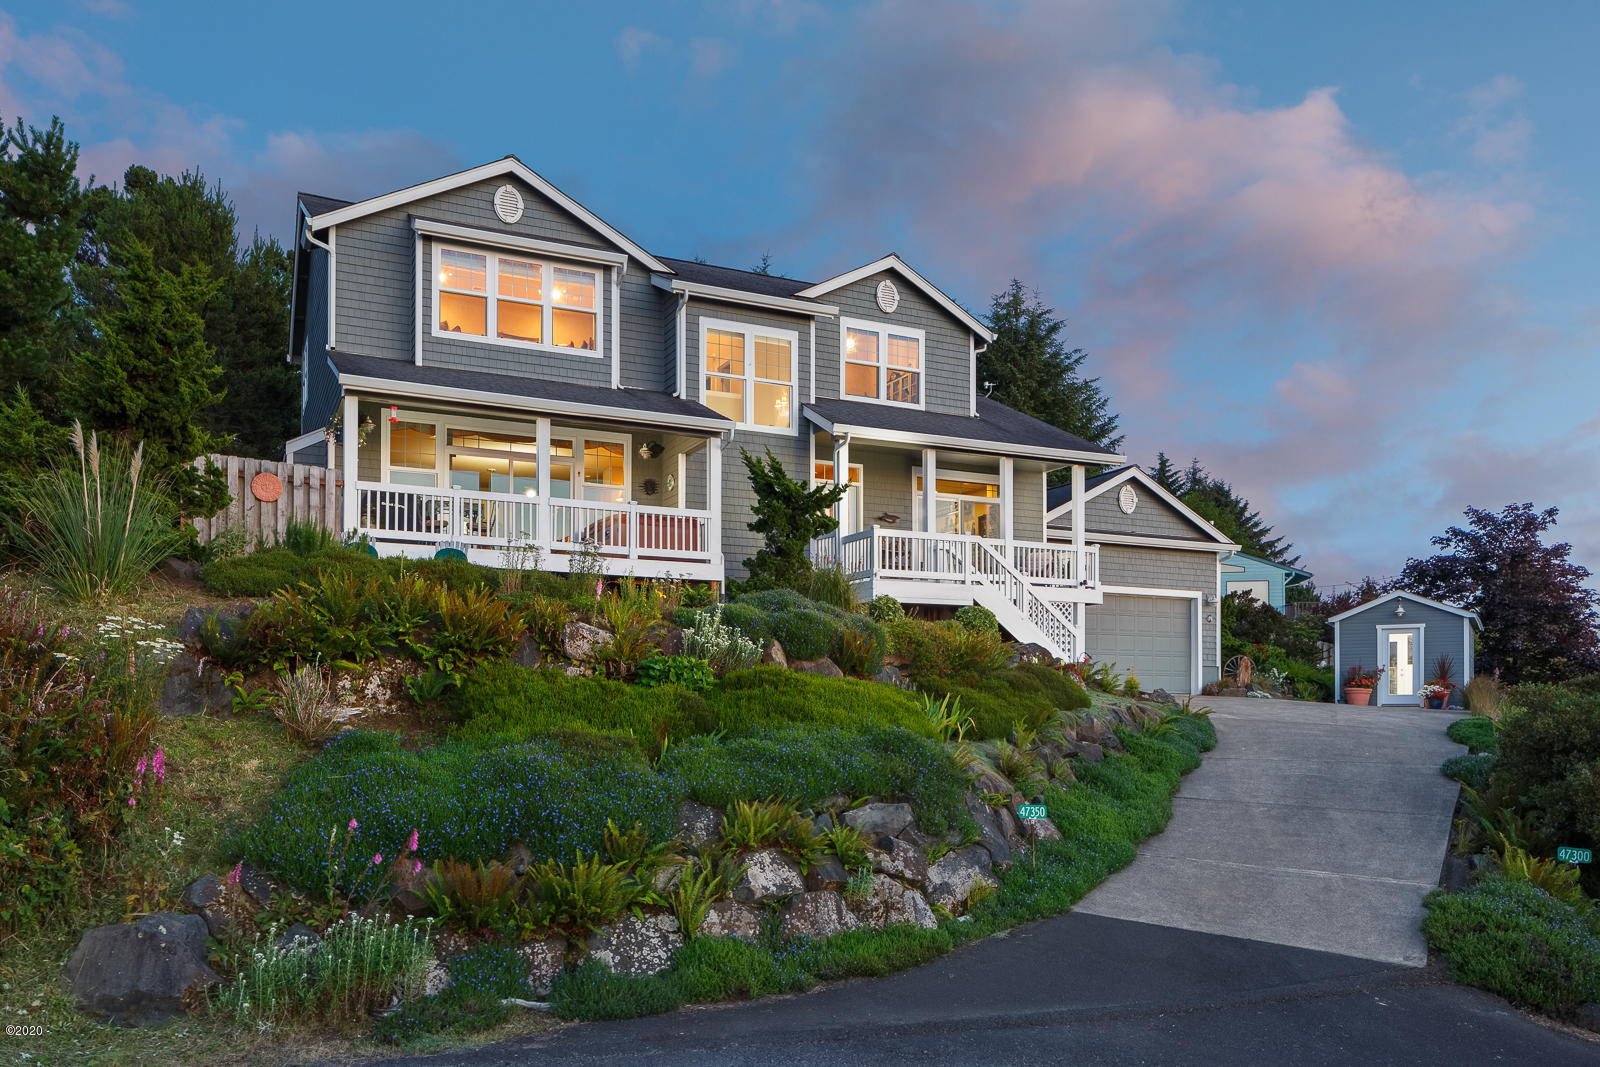 47350 Beach Hill Ct, Neskowin, OR 97149 - Beach Hill CT